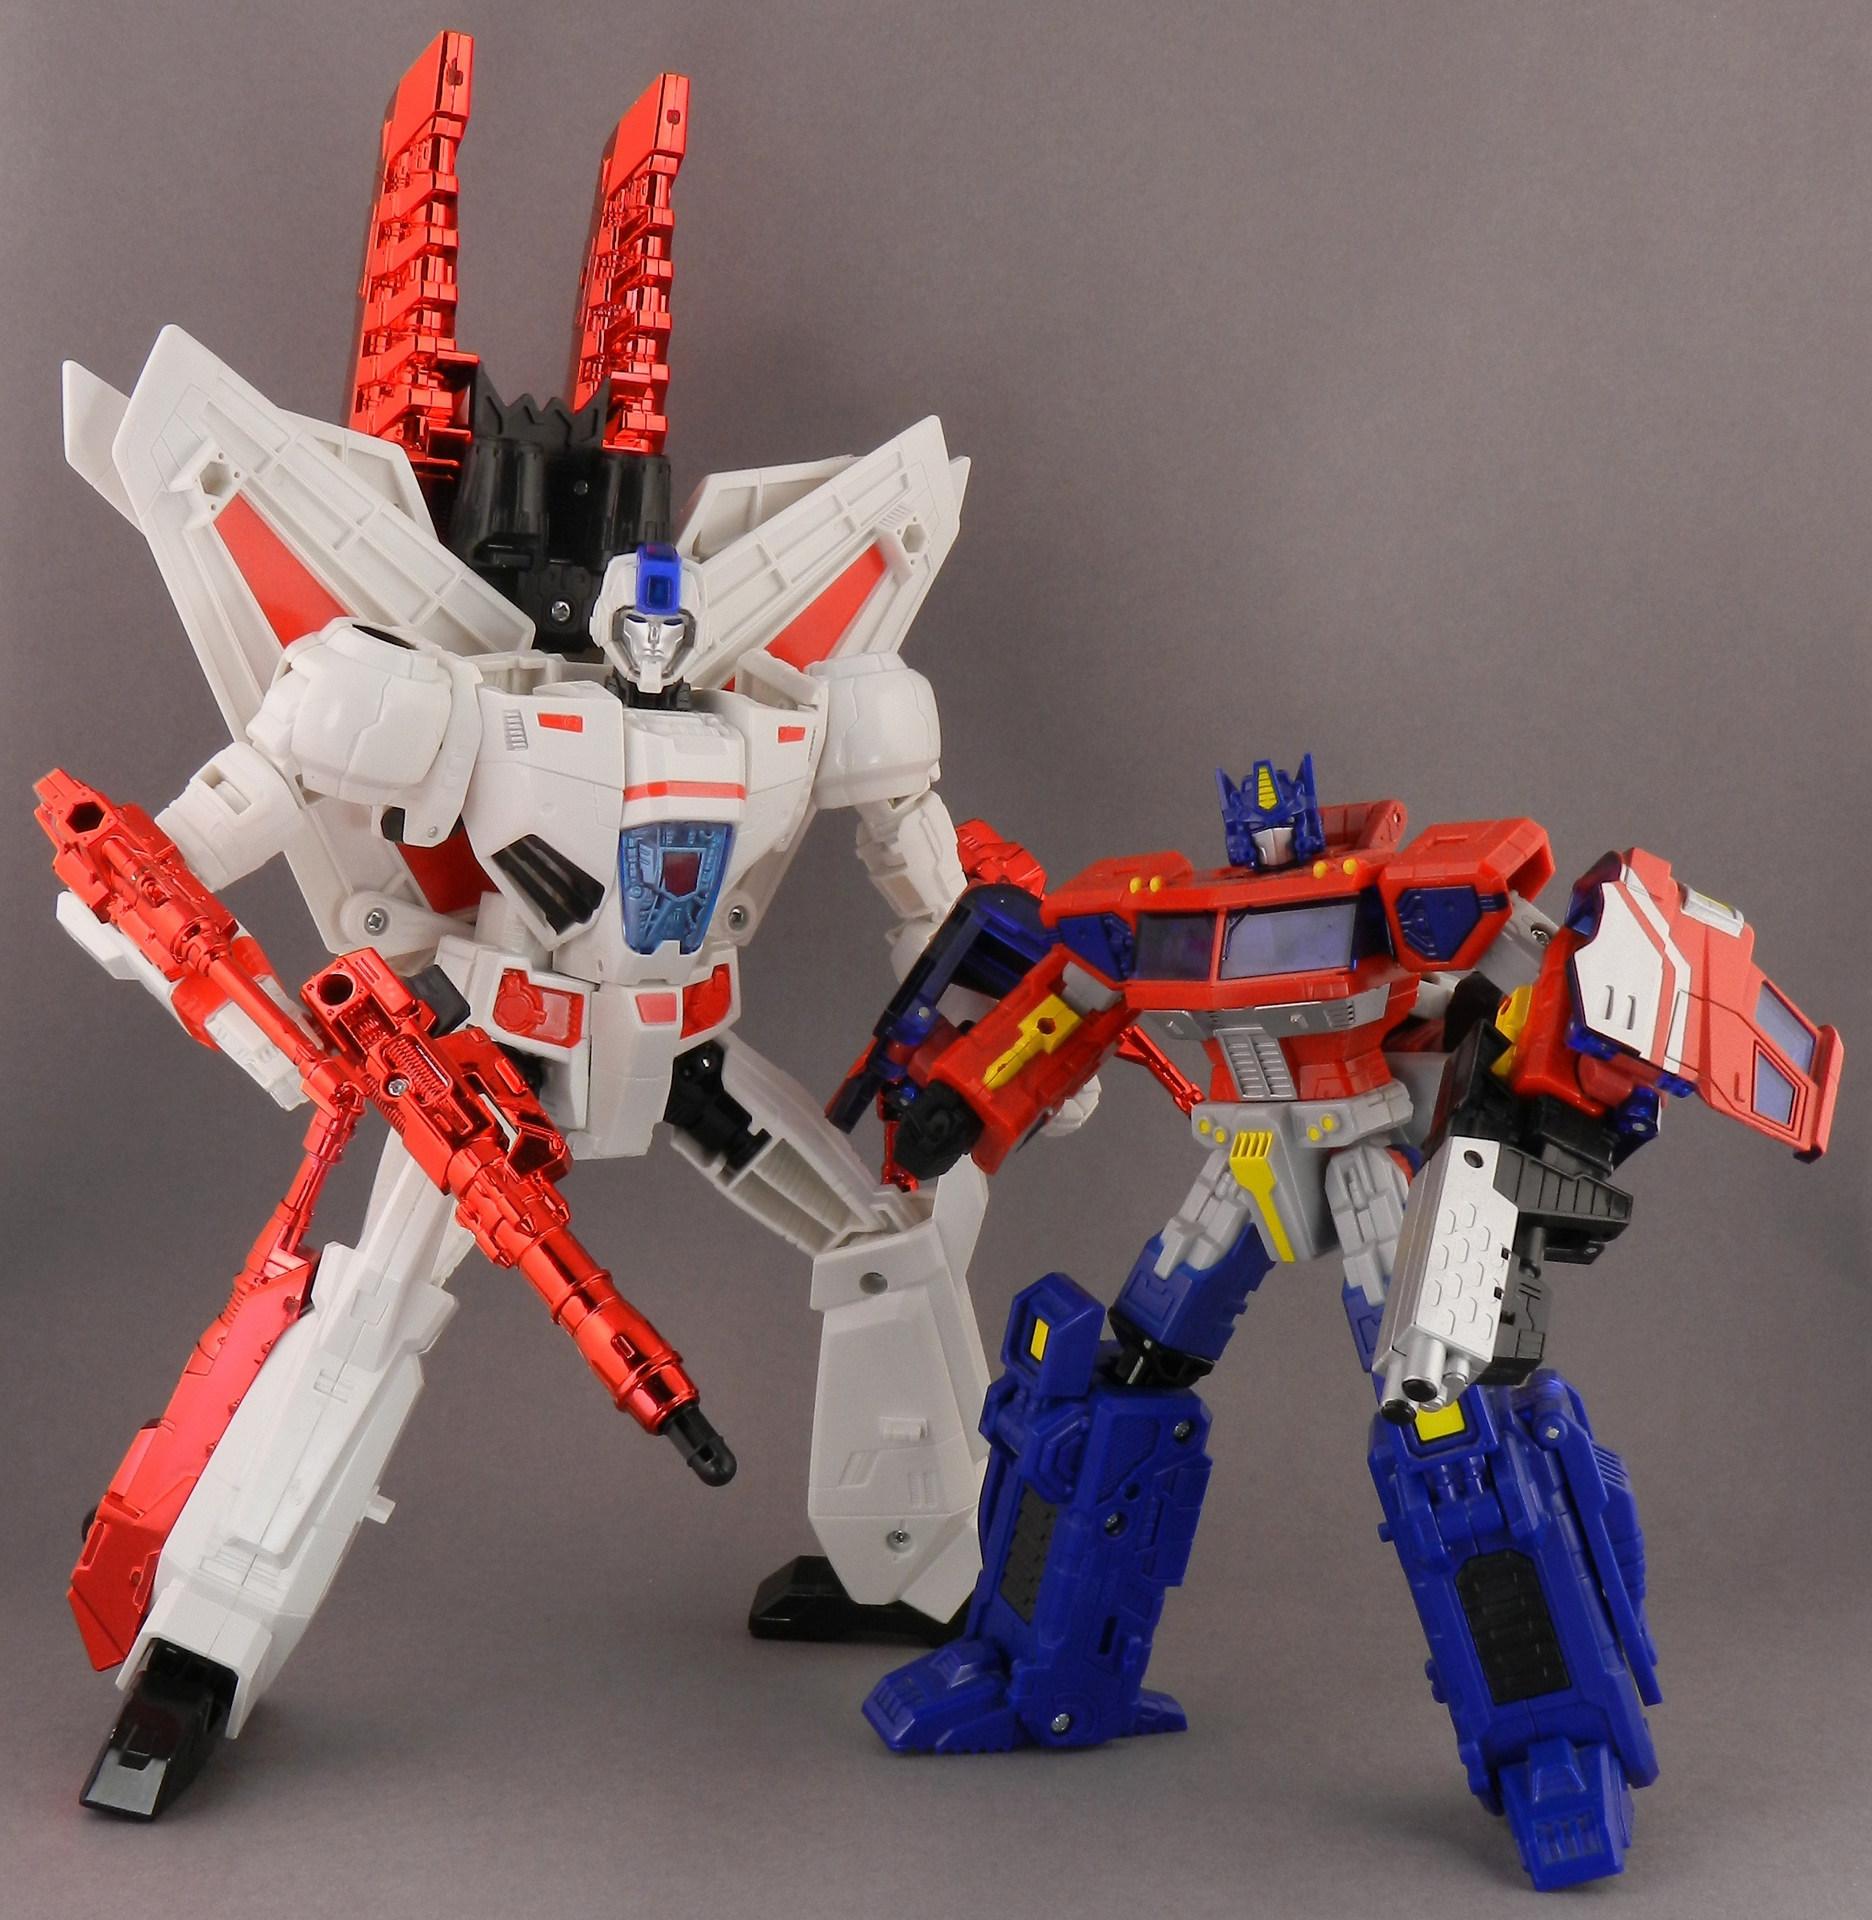 tfws generations jetfire inhand gallery transformers